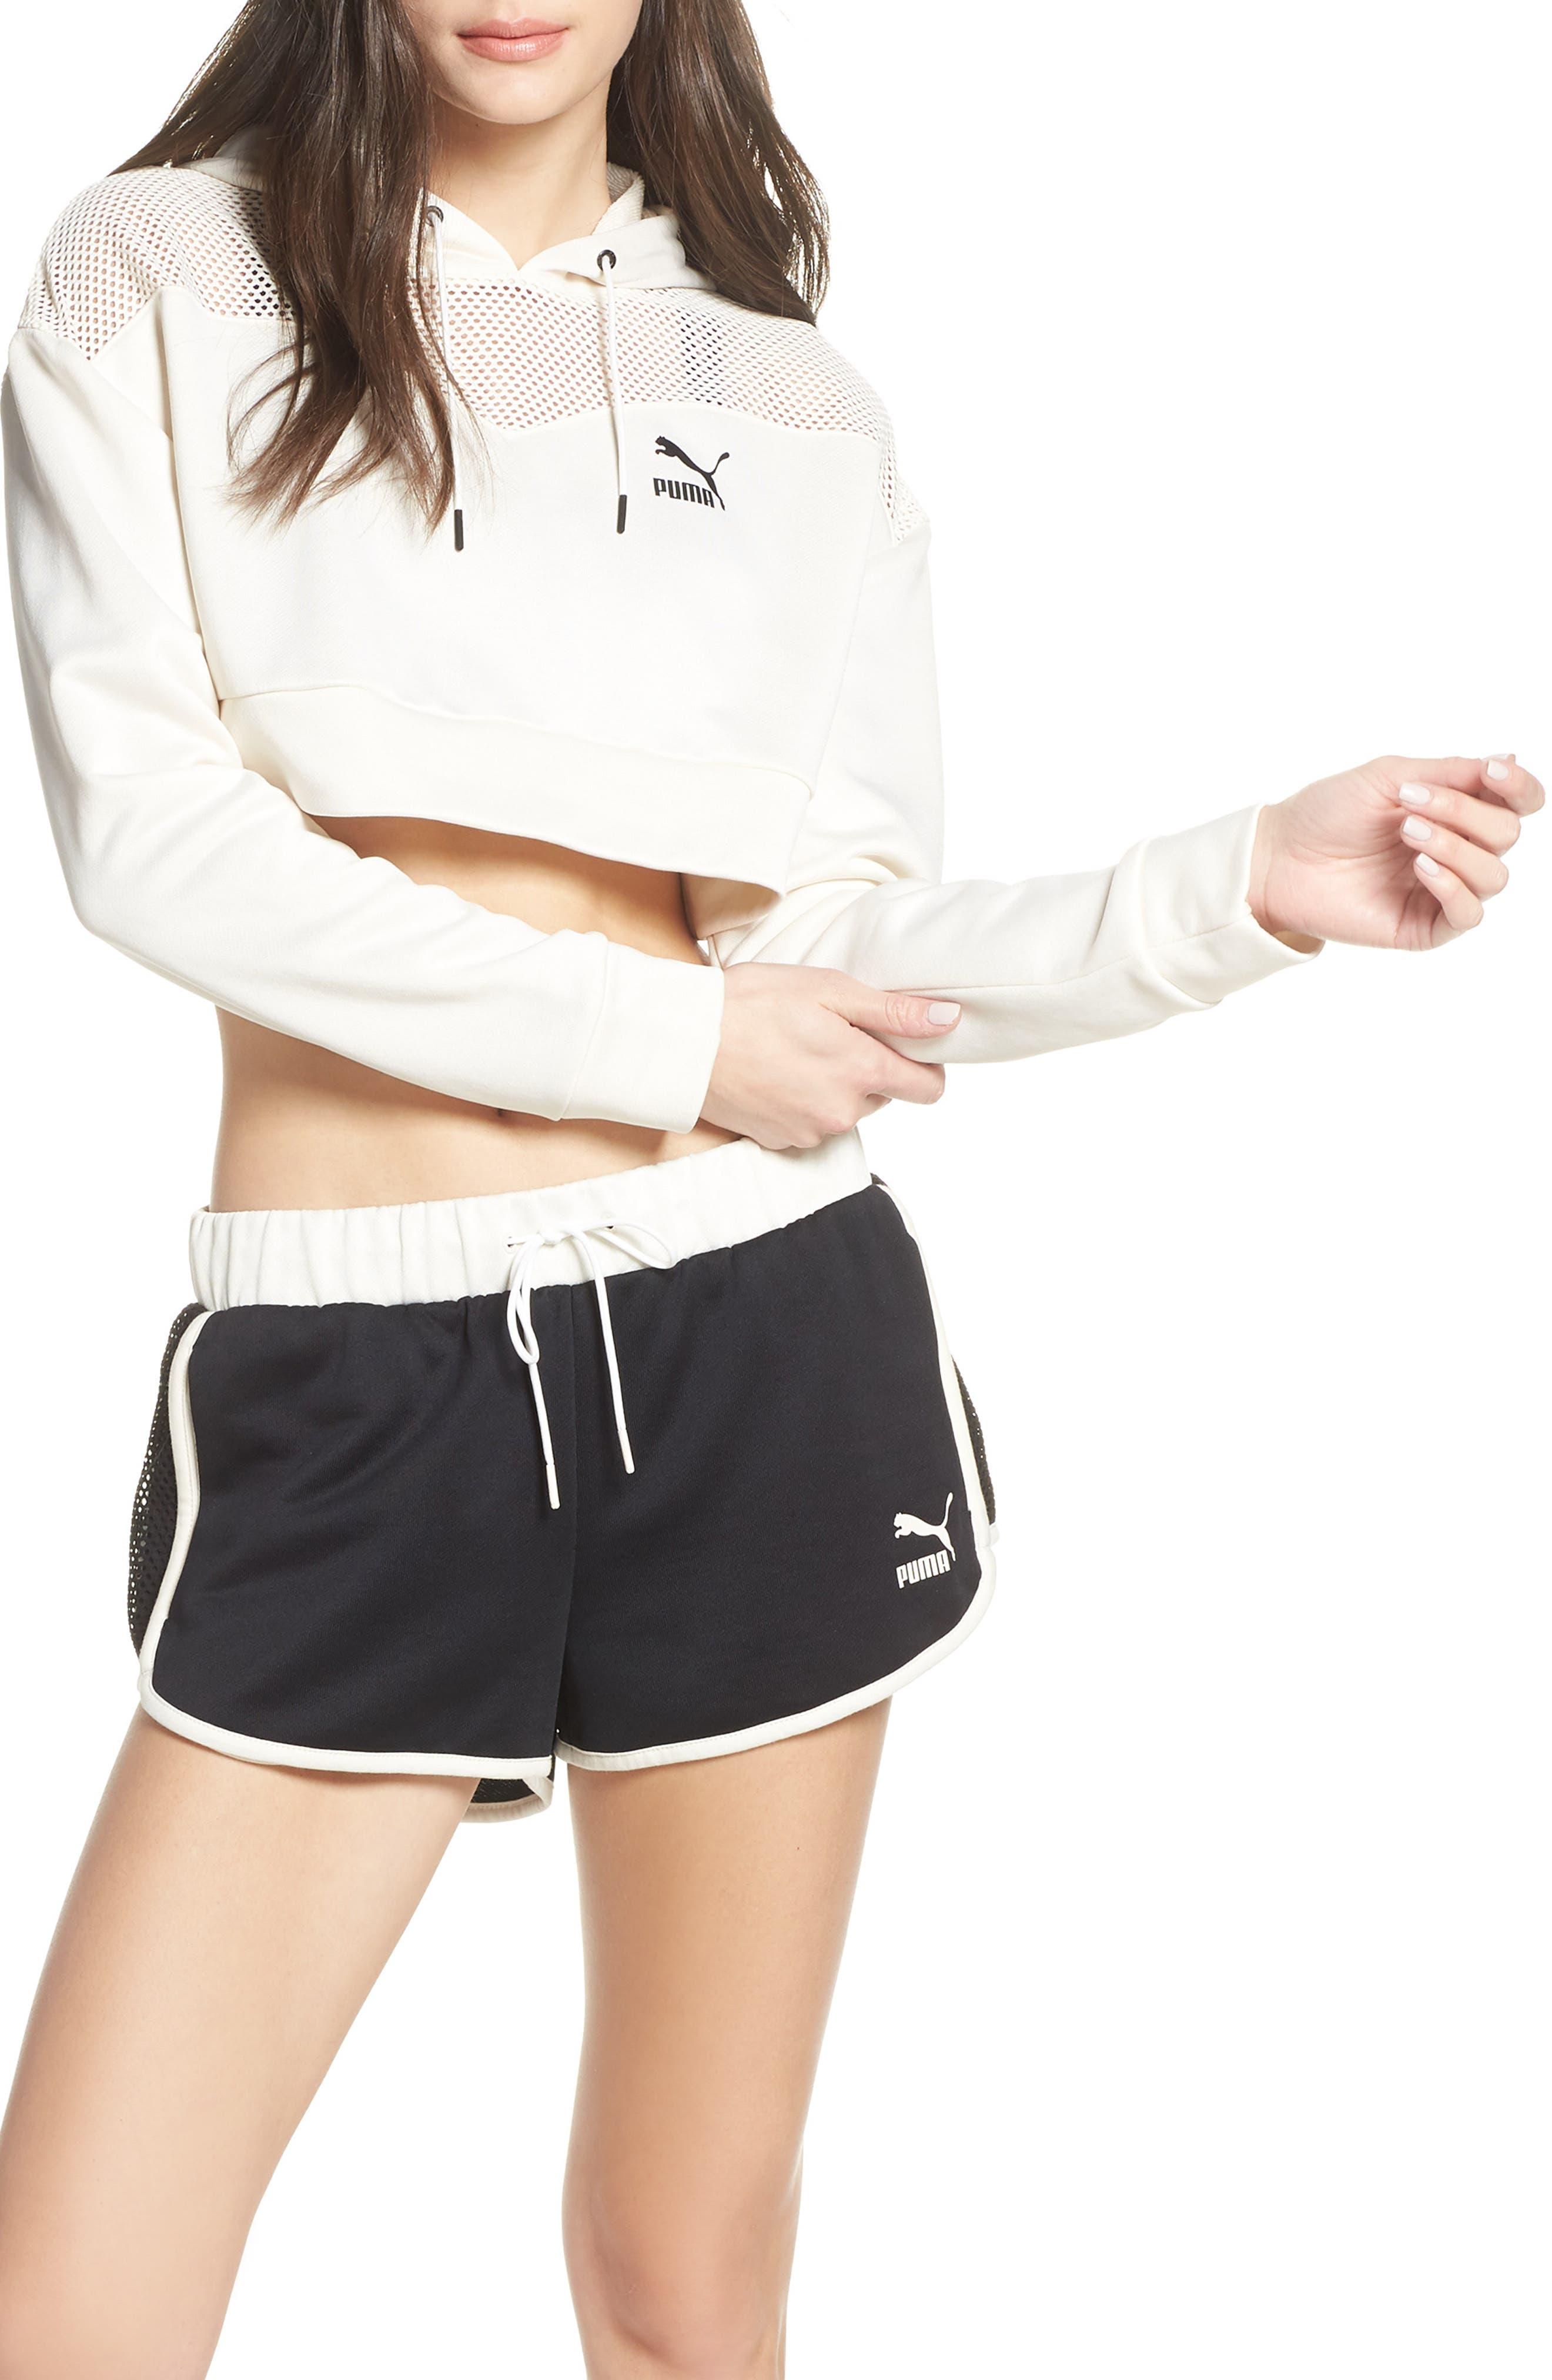 PUMA, Flourish Crop Hooded Sweatshirt, Main thumbnail 1, color, WHISPER WHITE-PUMA BLACK